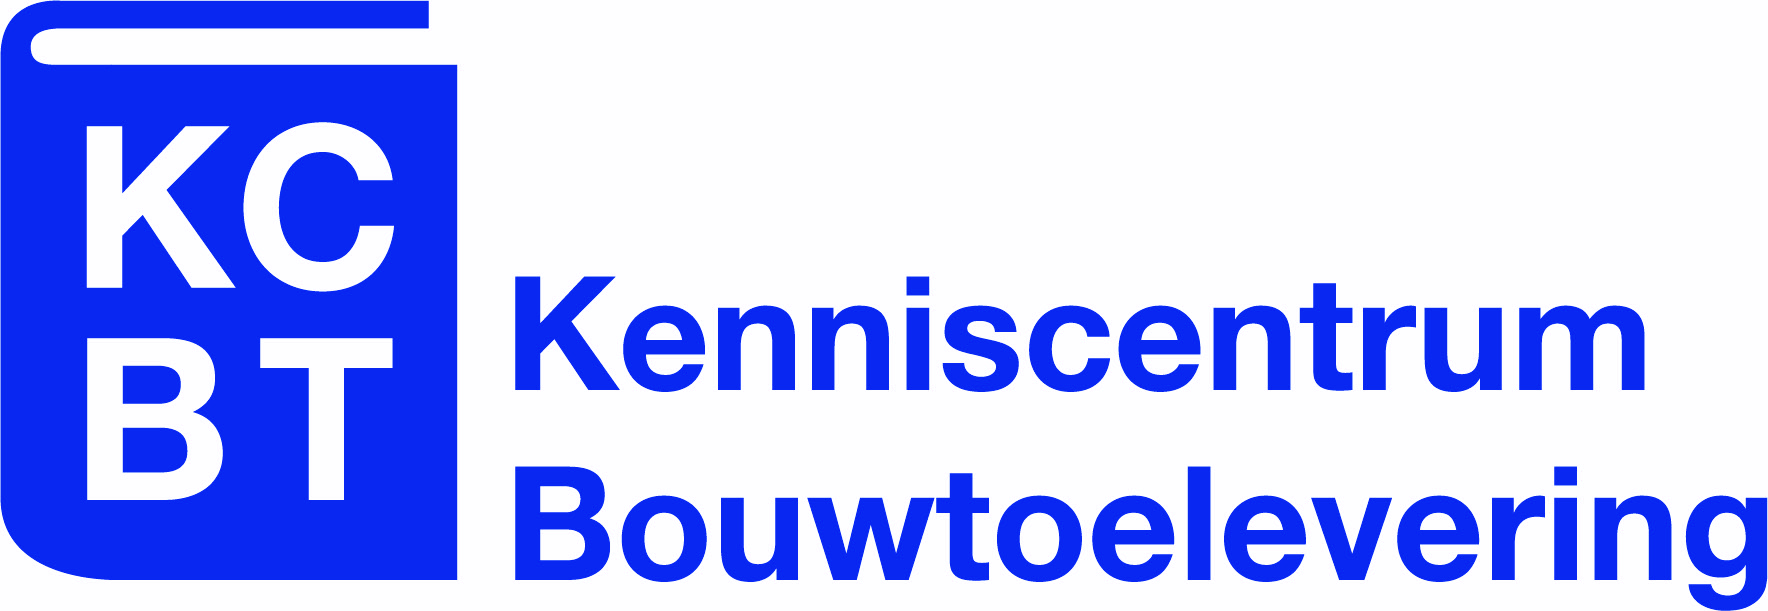 Kenniscentrum Bouwtoelevering